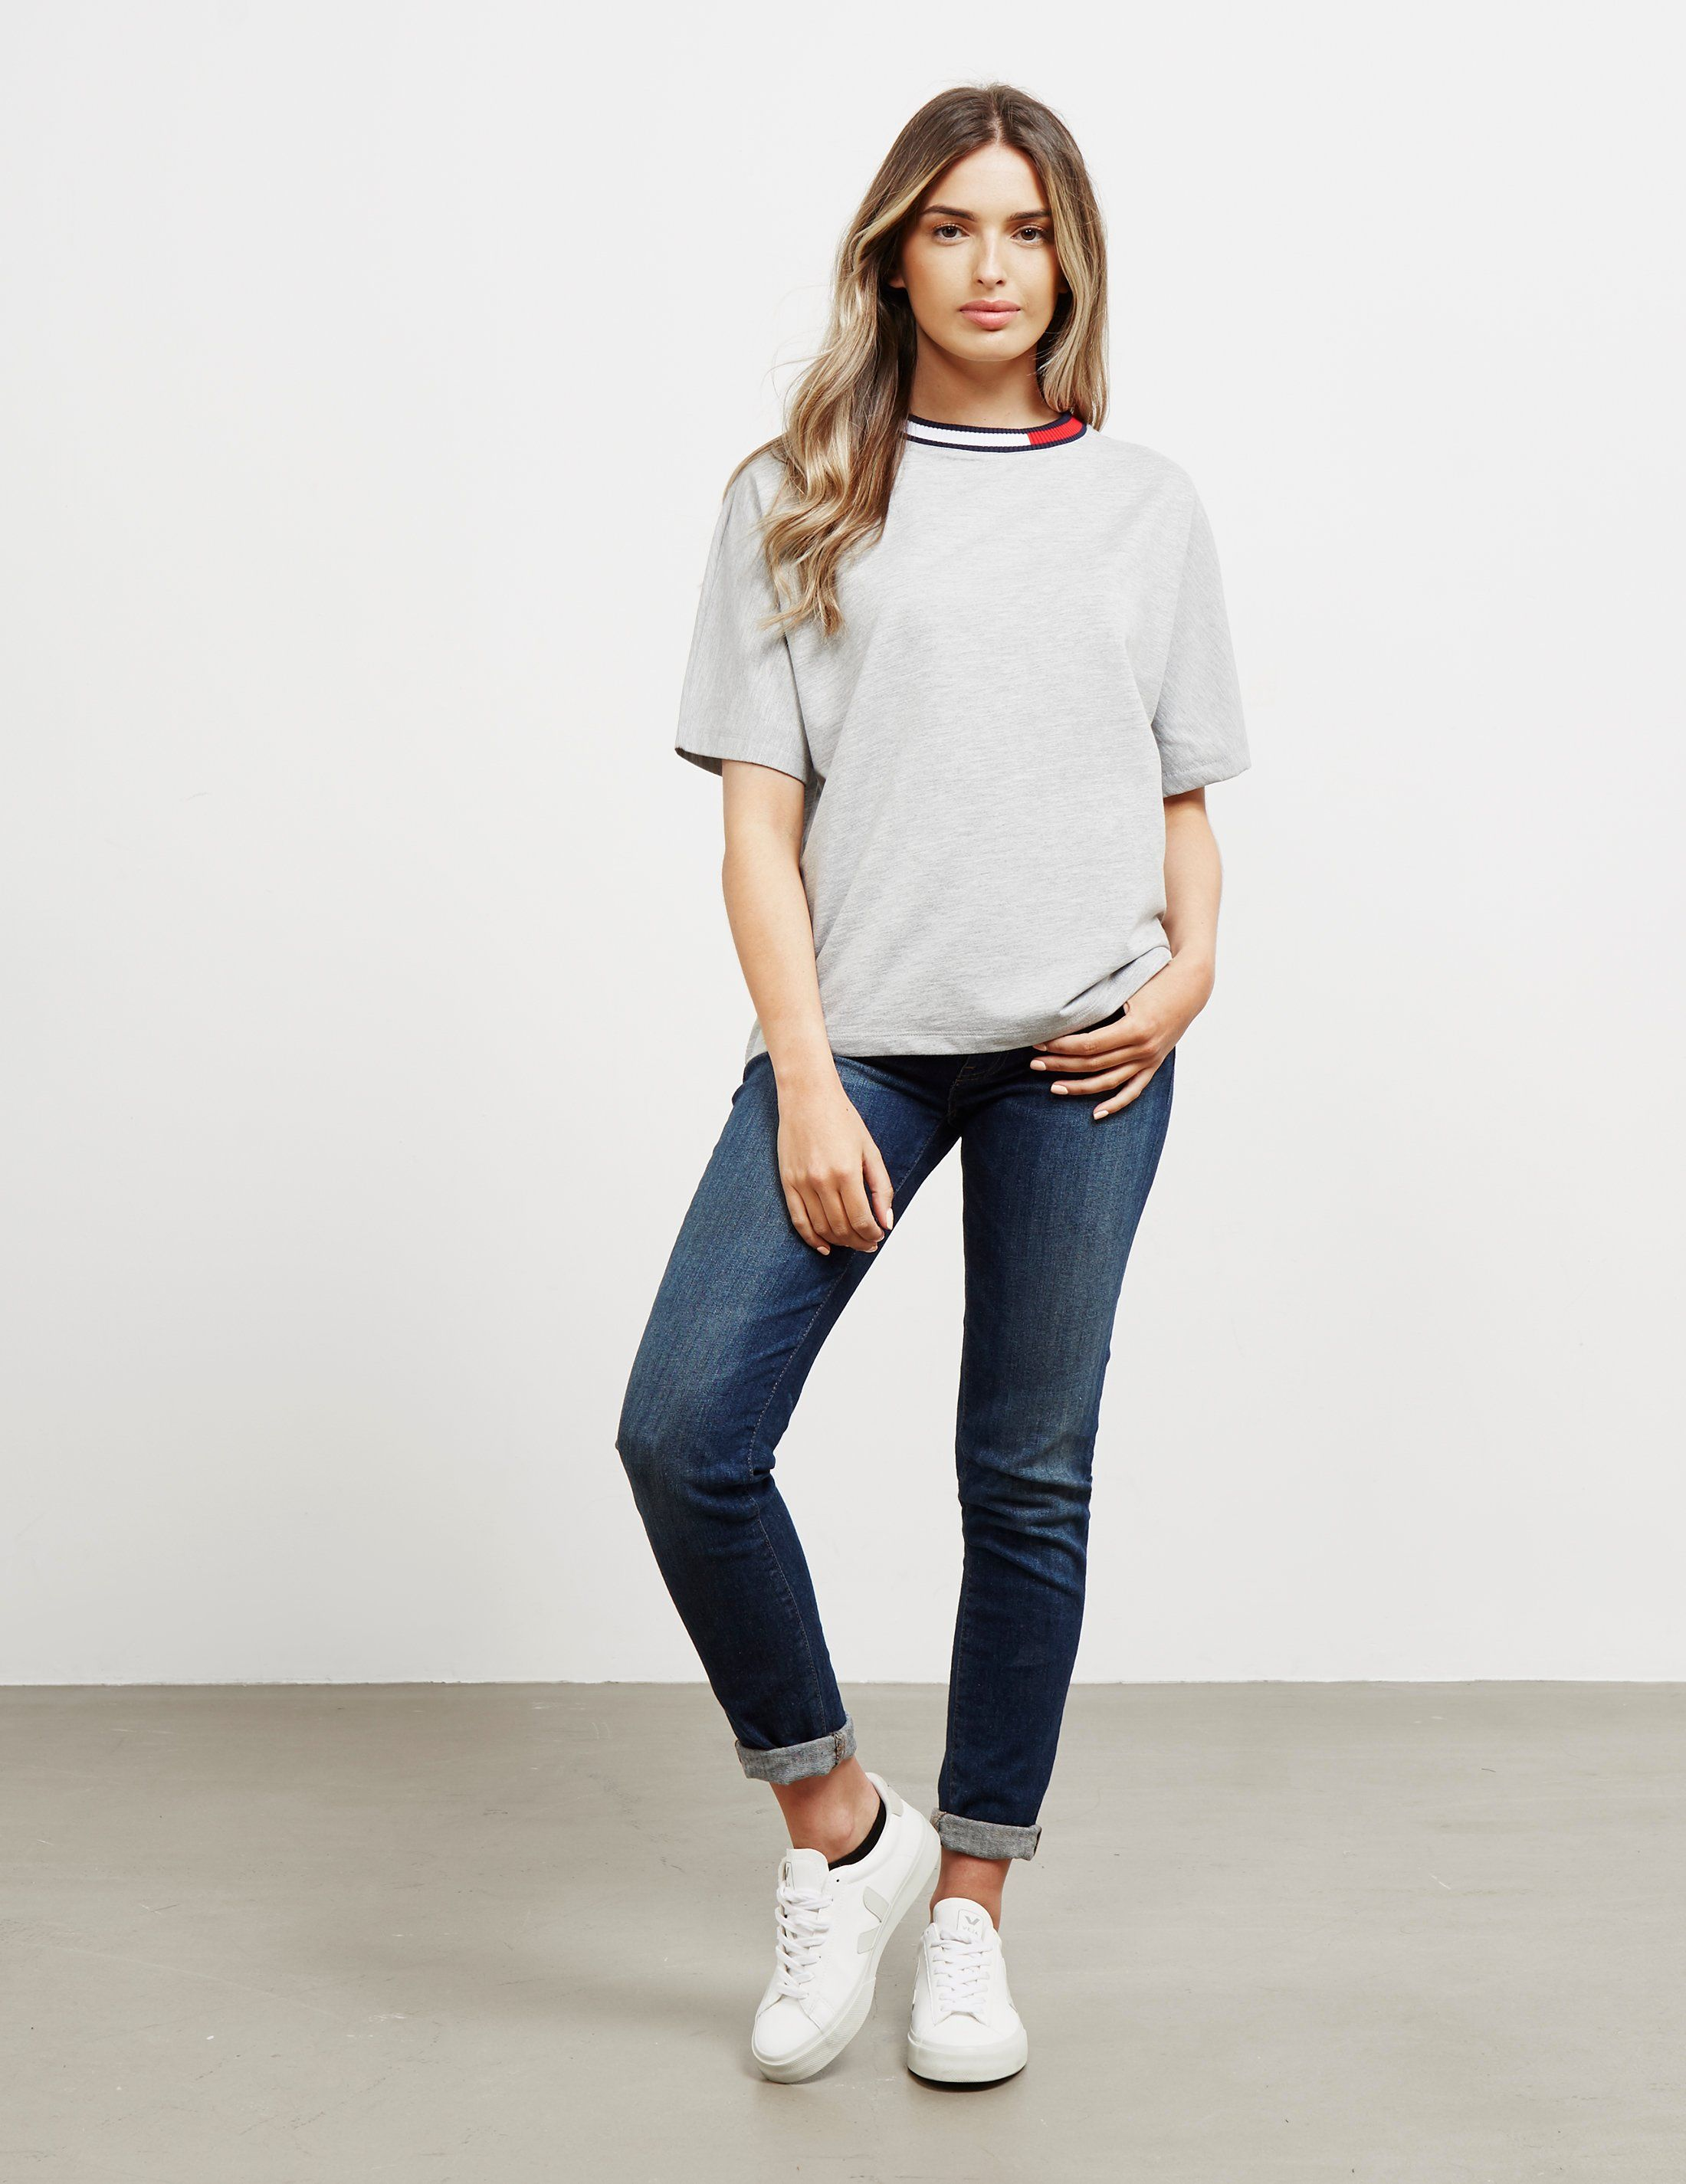 Tommy Hilfiger Flag Short Sleeve T-Shirt